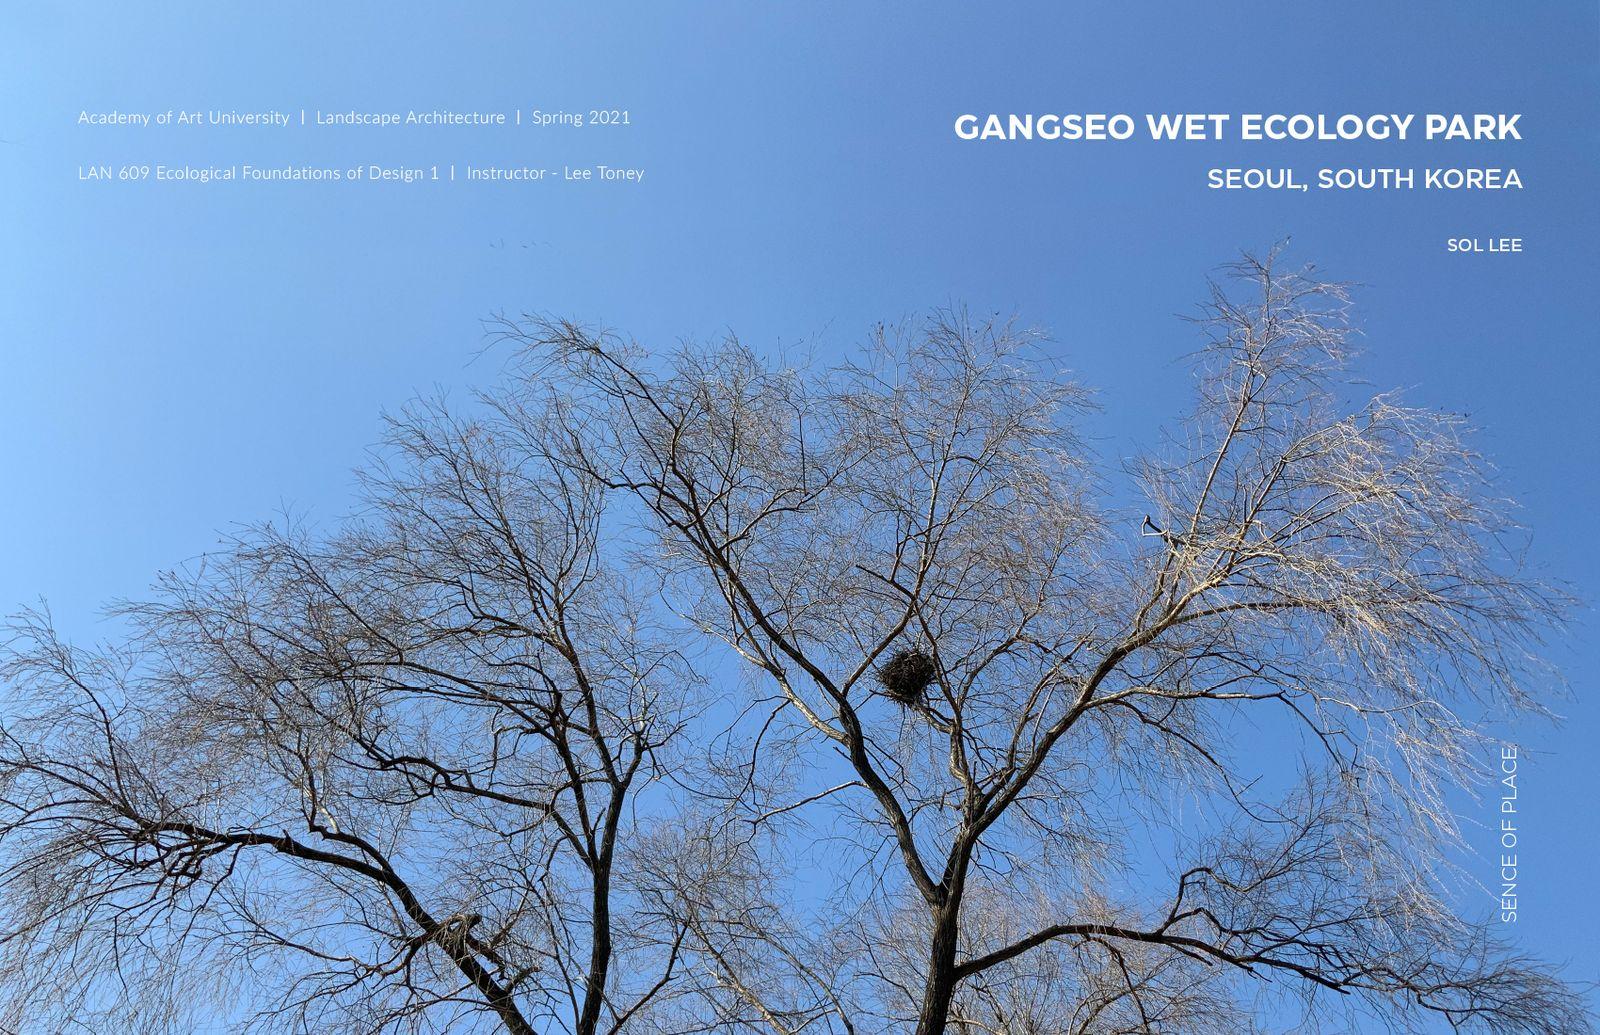 Gangseo Wet Ecology Park